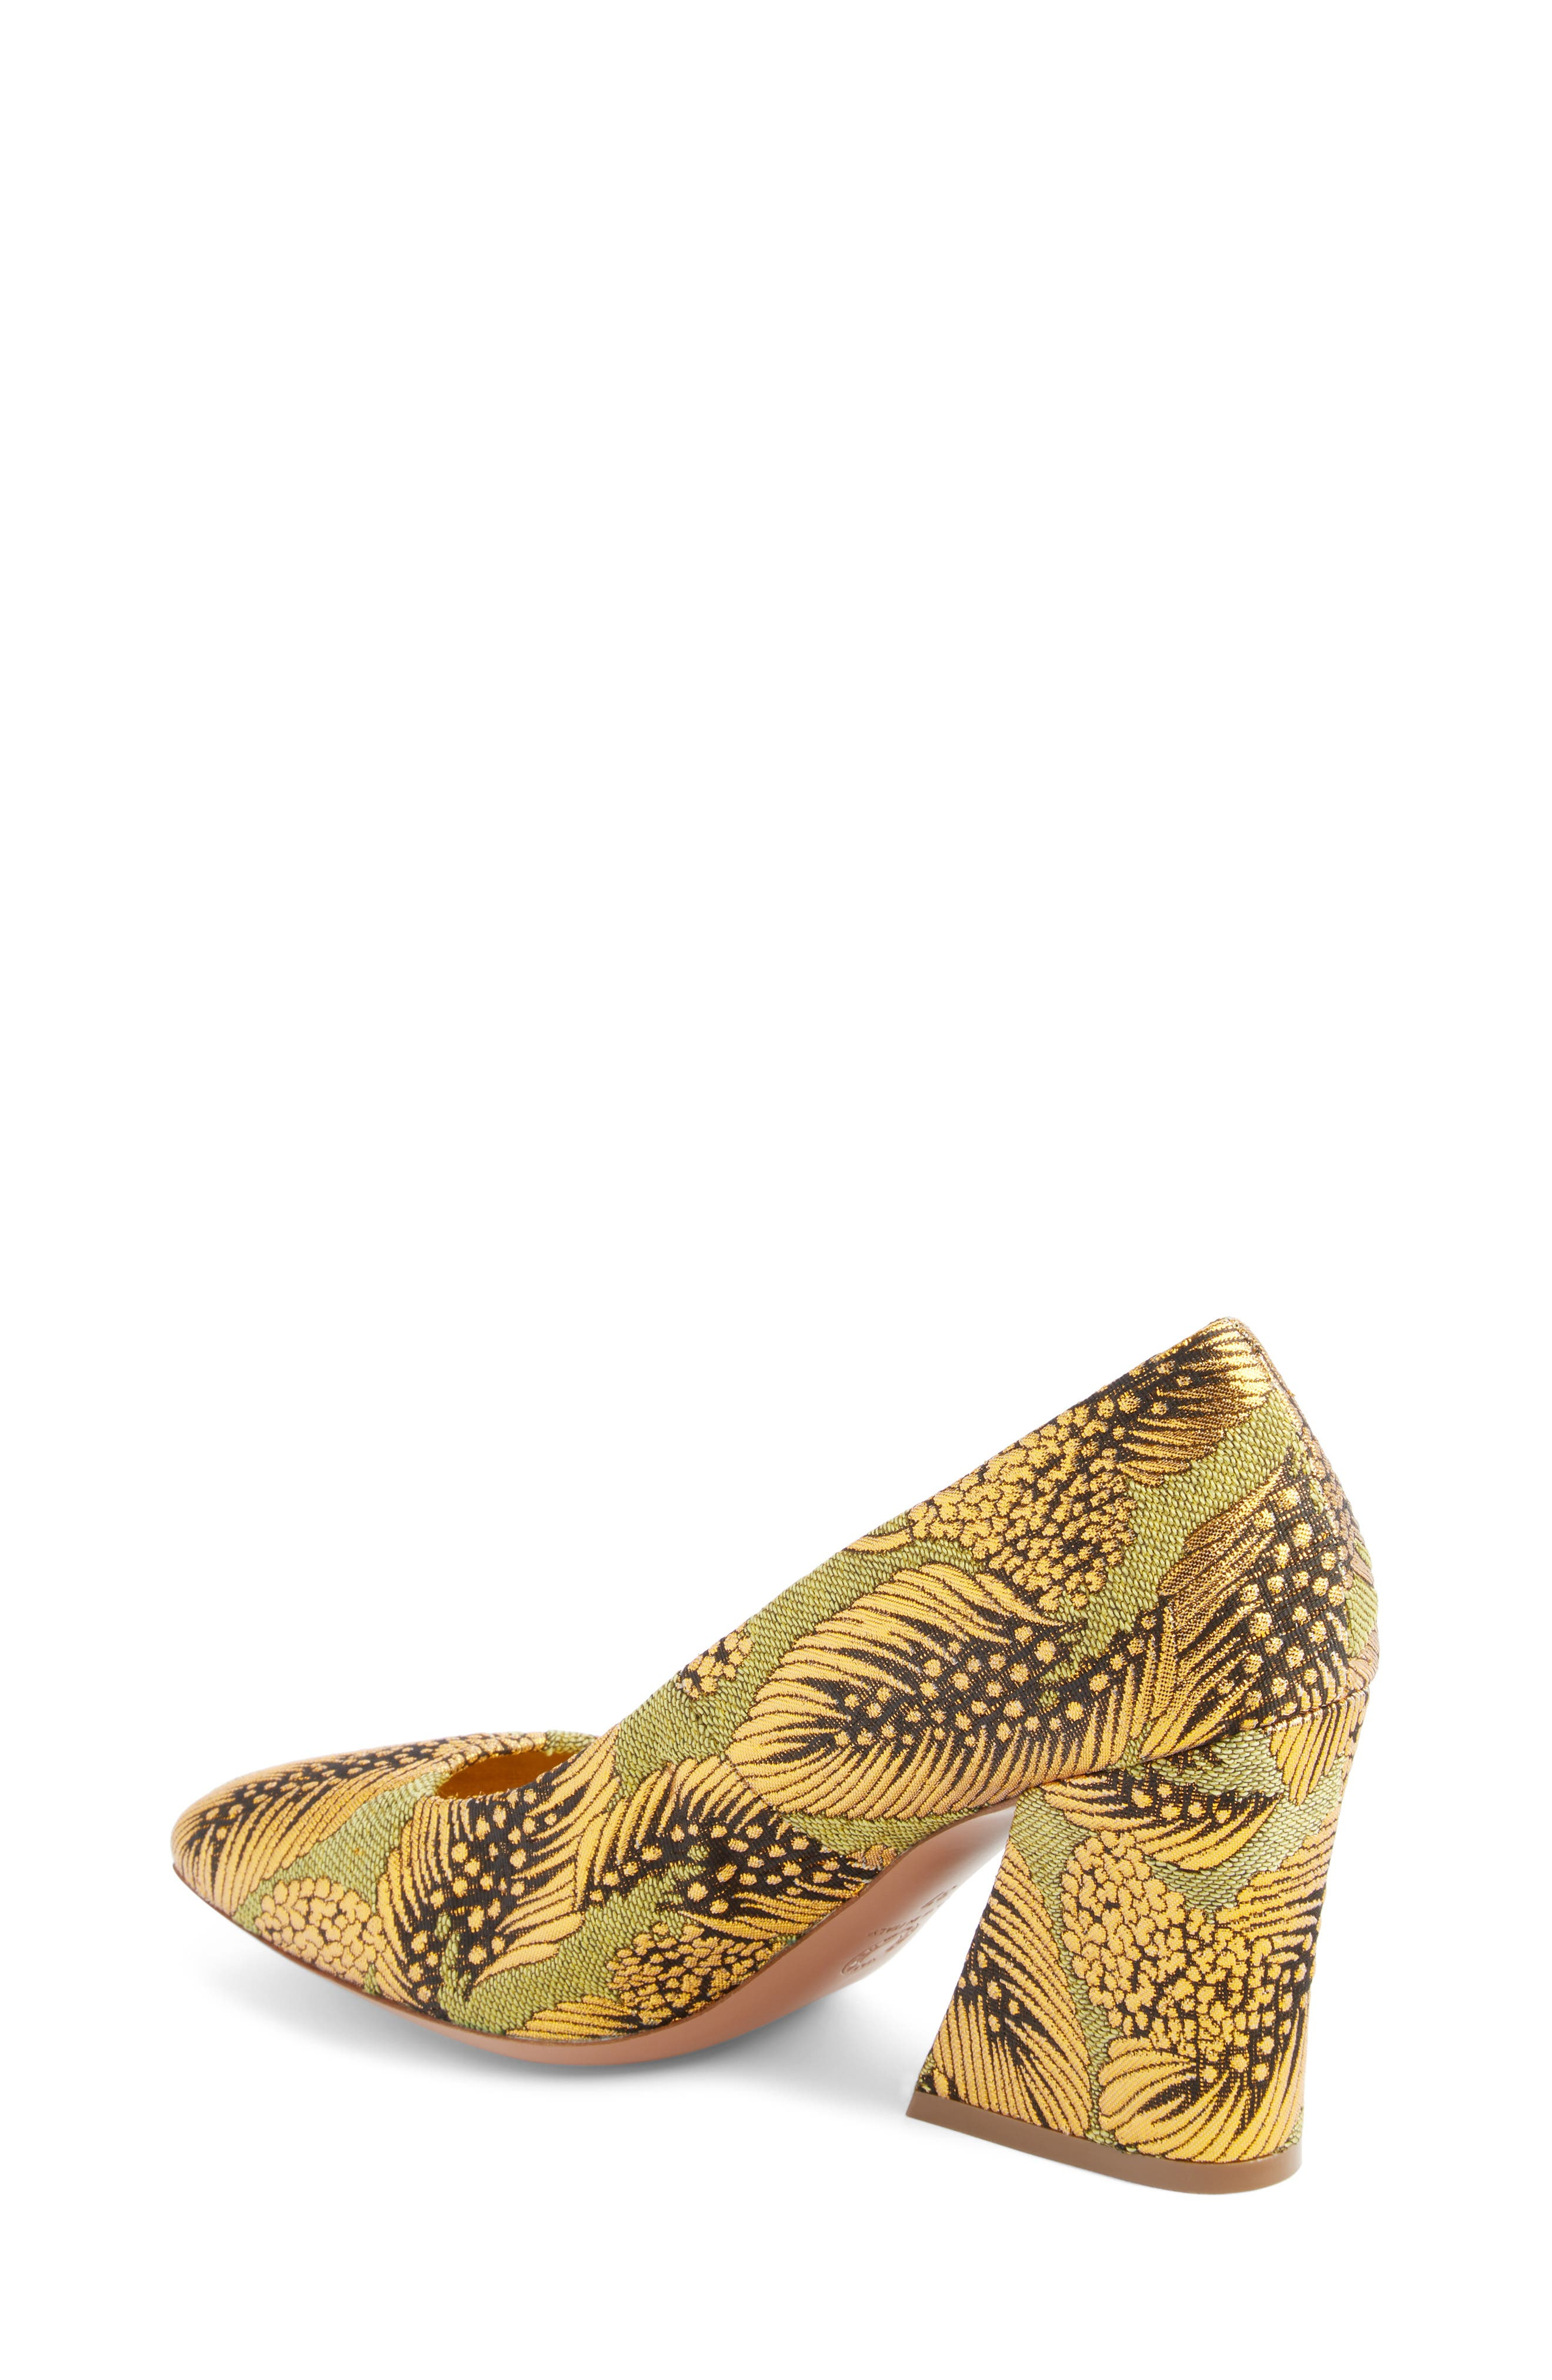 Leaf Print Angle Heel Pump,                             Alternate thumbnail 2, color,                             Gold